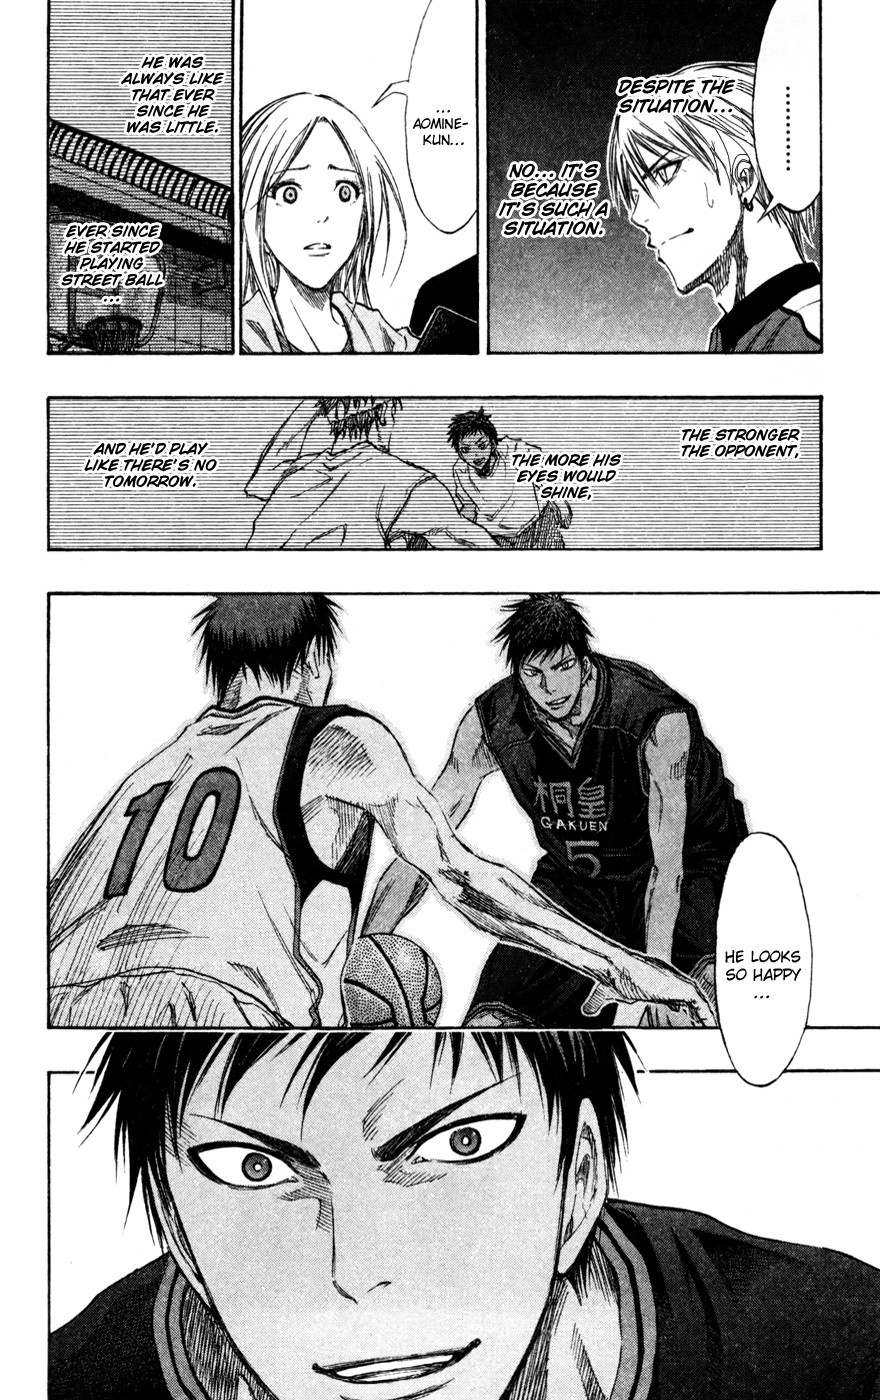 Kuroko no Basket Manga Chapter 136 - Image 14